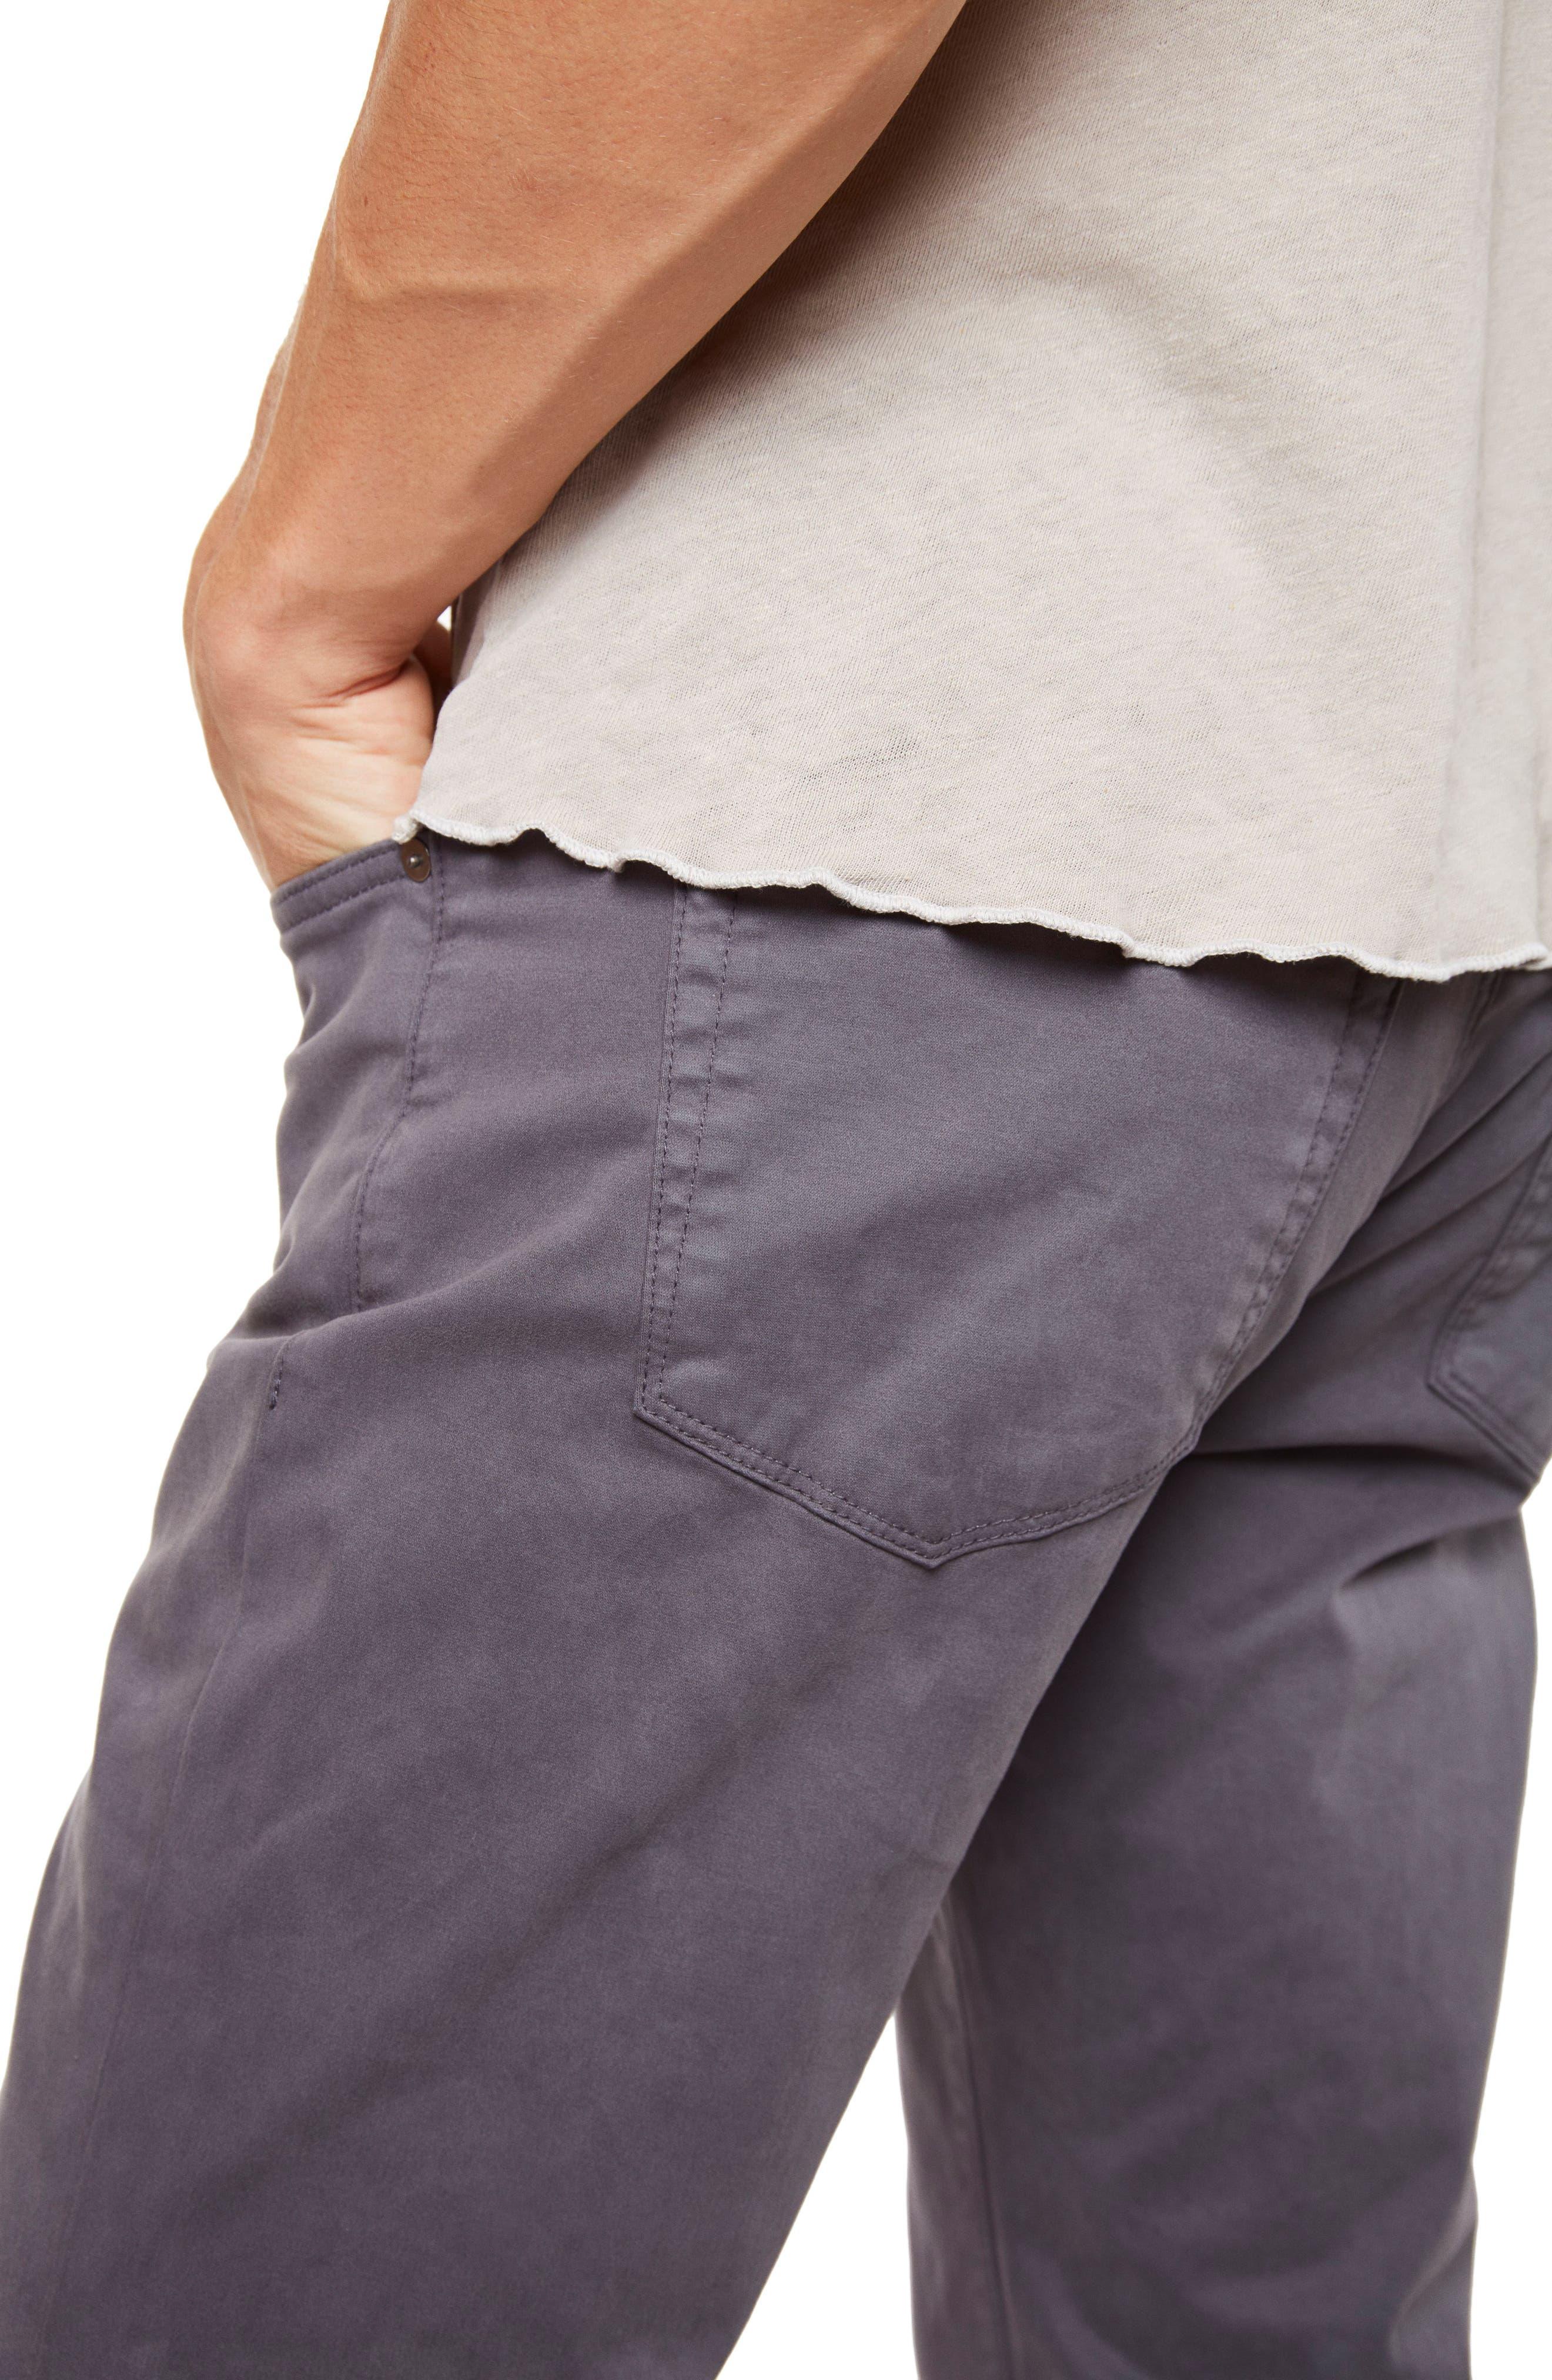 'Kane' Slim Fit Cotton Twill Pants,                             Alternate thumbnail 4, color,                             Graben